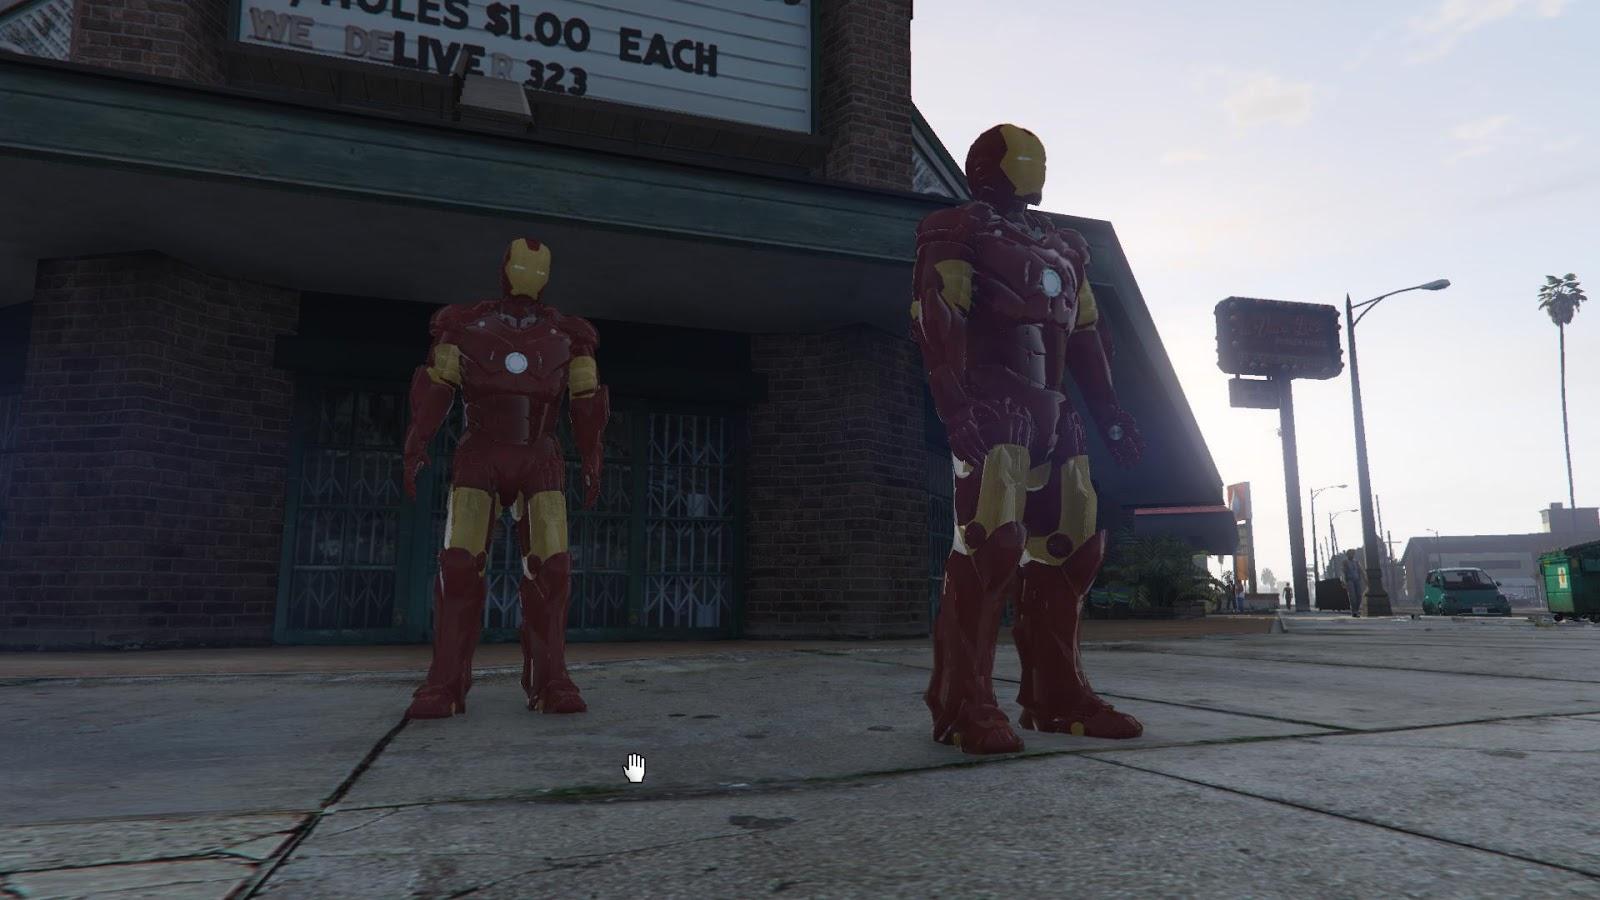 GTA X Scripting: GTA V - Ironman Mark III armor release and